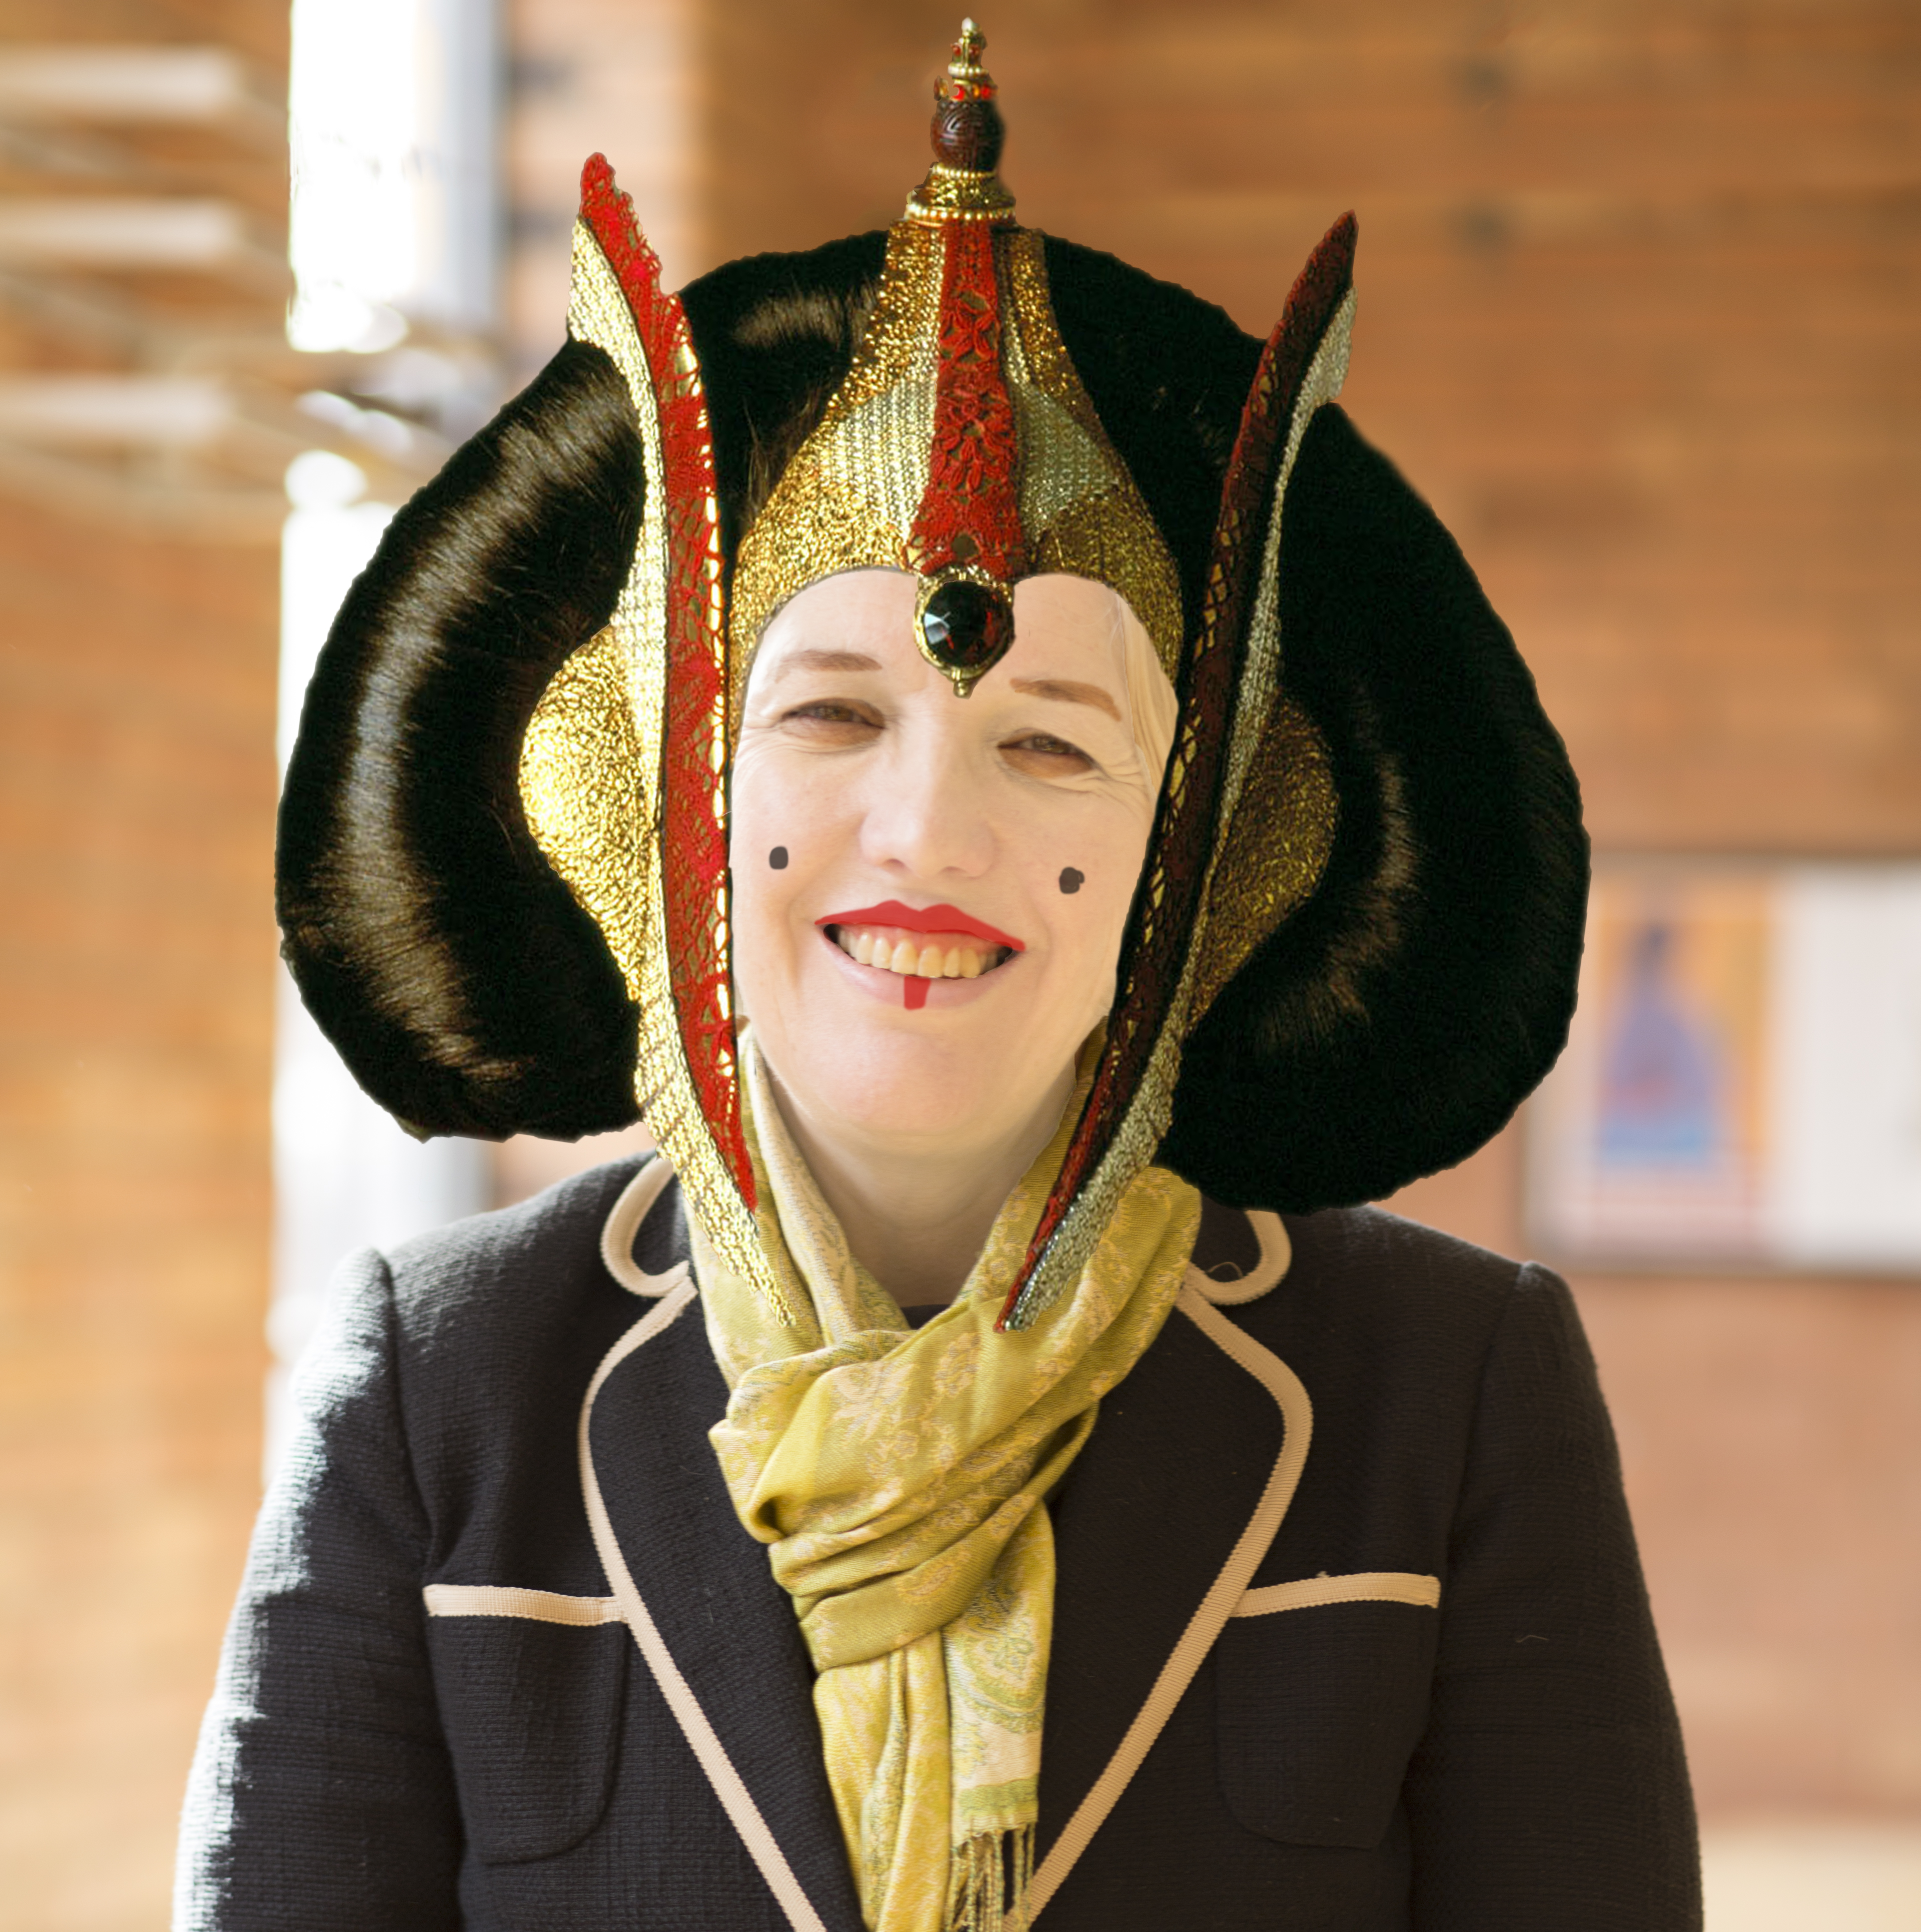 Lib Dem candidate Beverly Nielsen mocked up to look like Princess Padmé Amidala